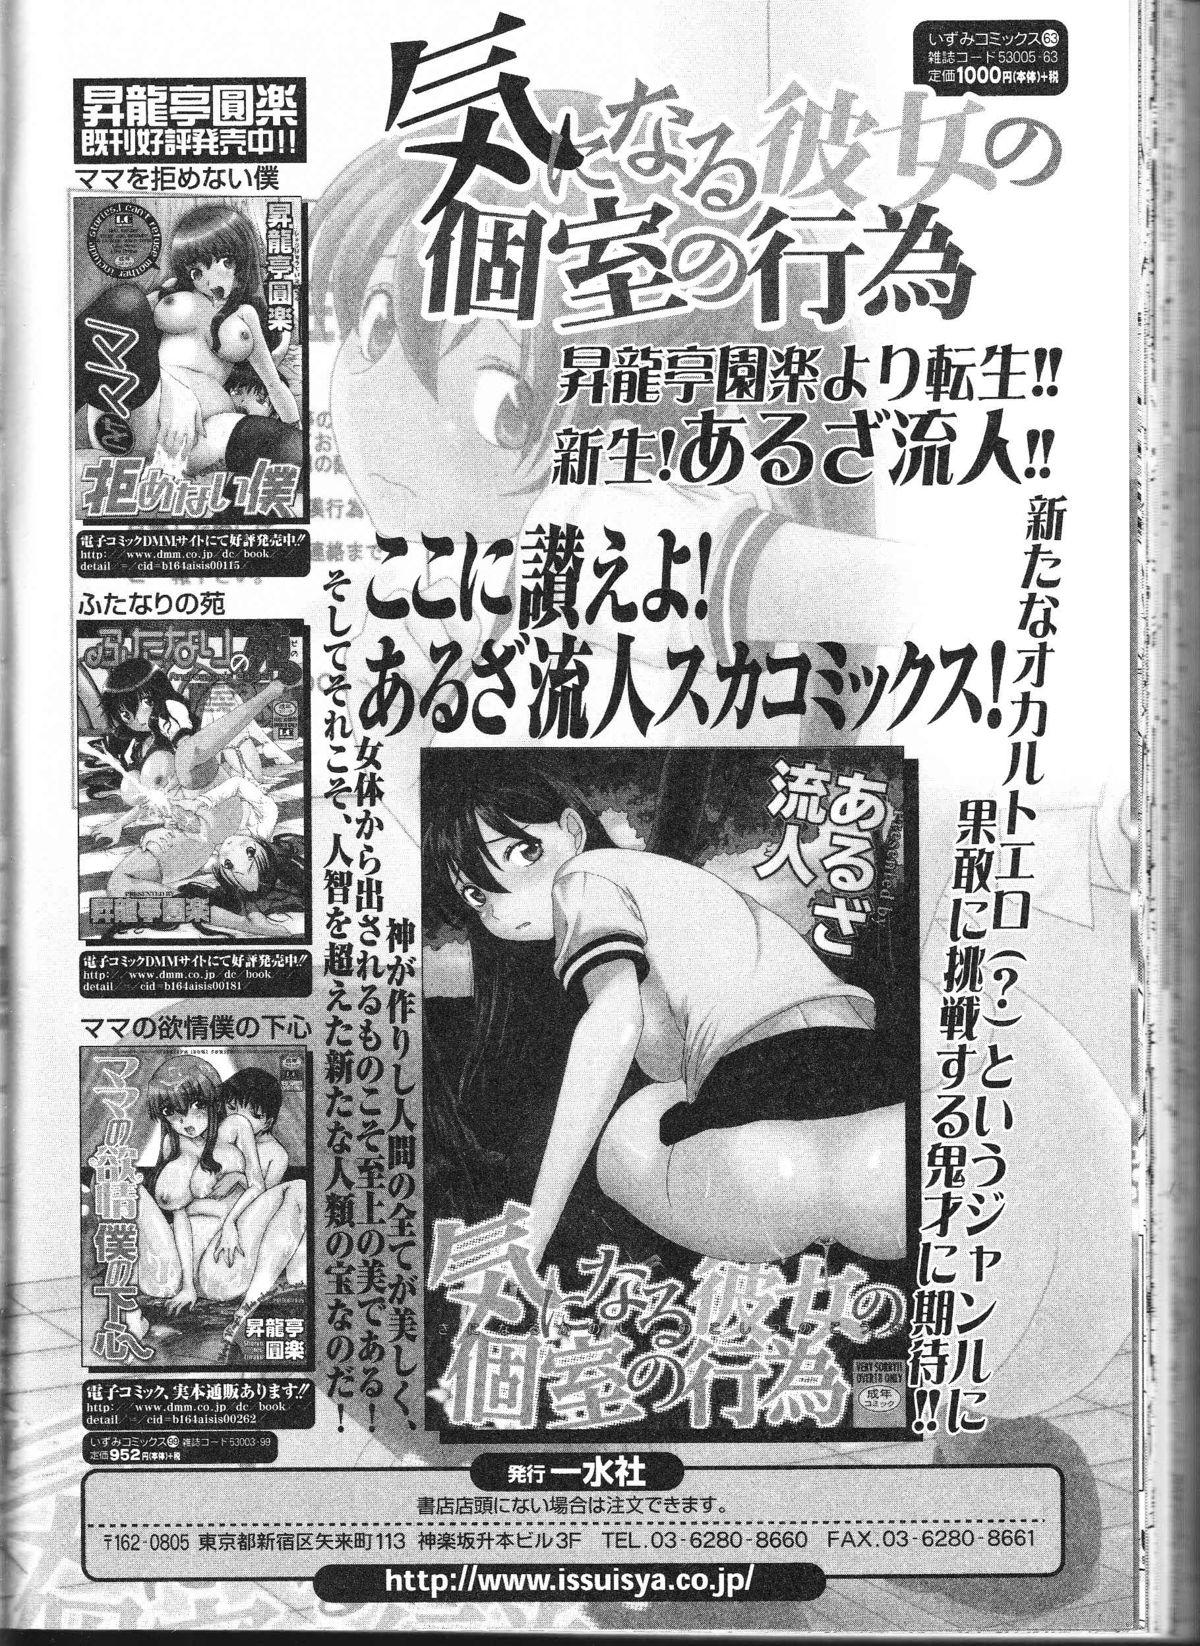 Nozoite wa Ikenai 9 - Do Not Peep! 9 160